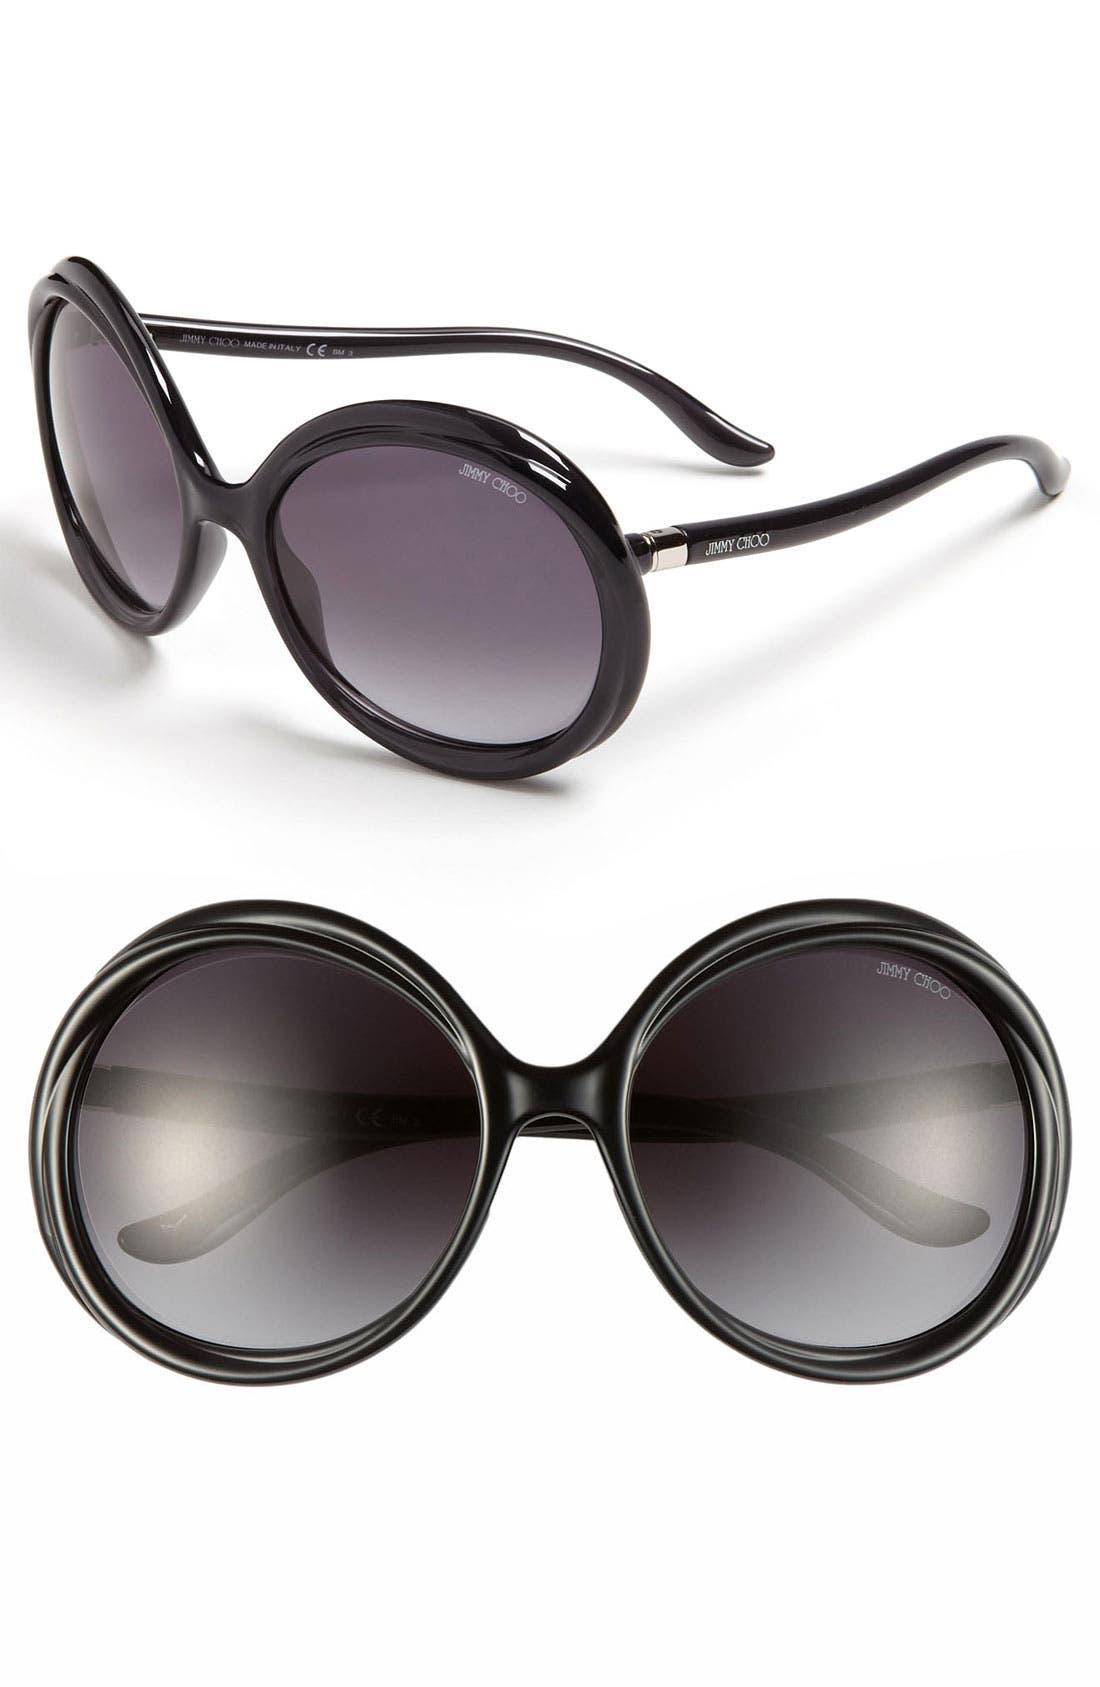 Main Image - Jimmy Choo 'Mindy' 59mm Sunglasses